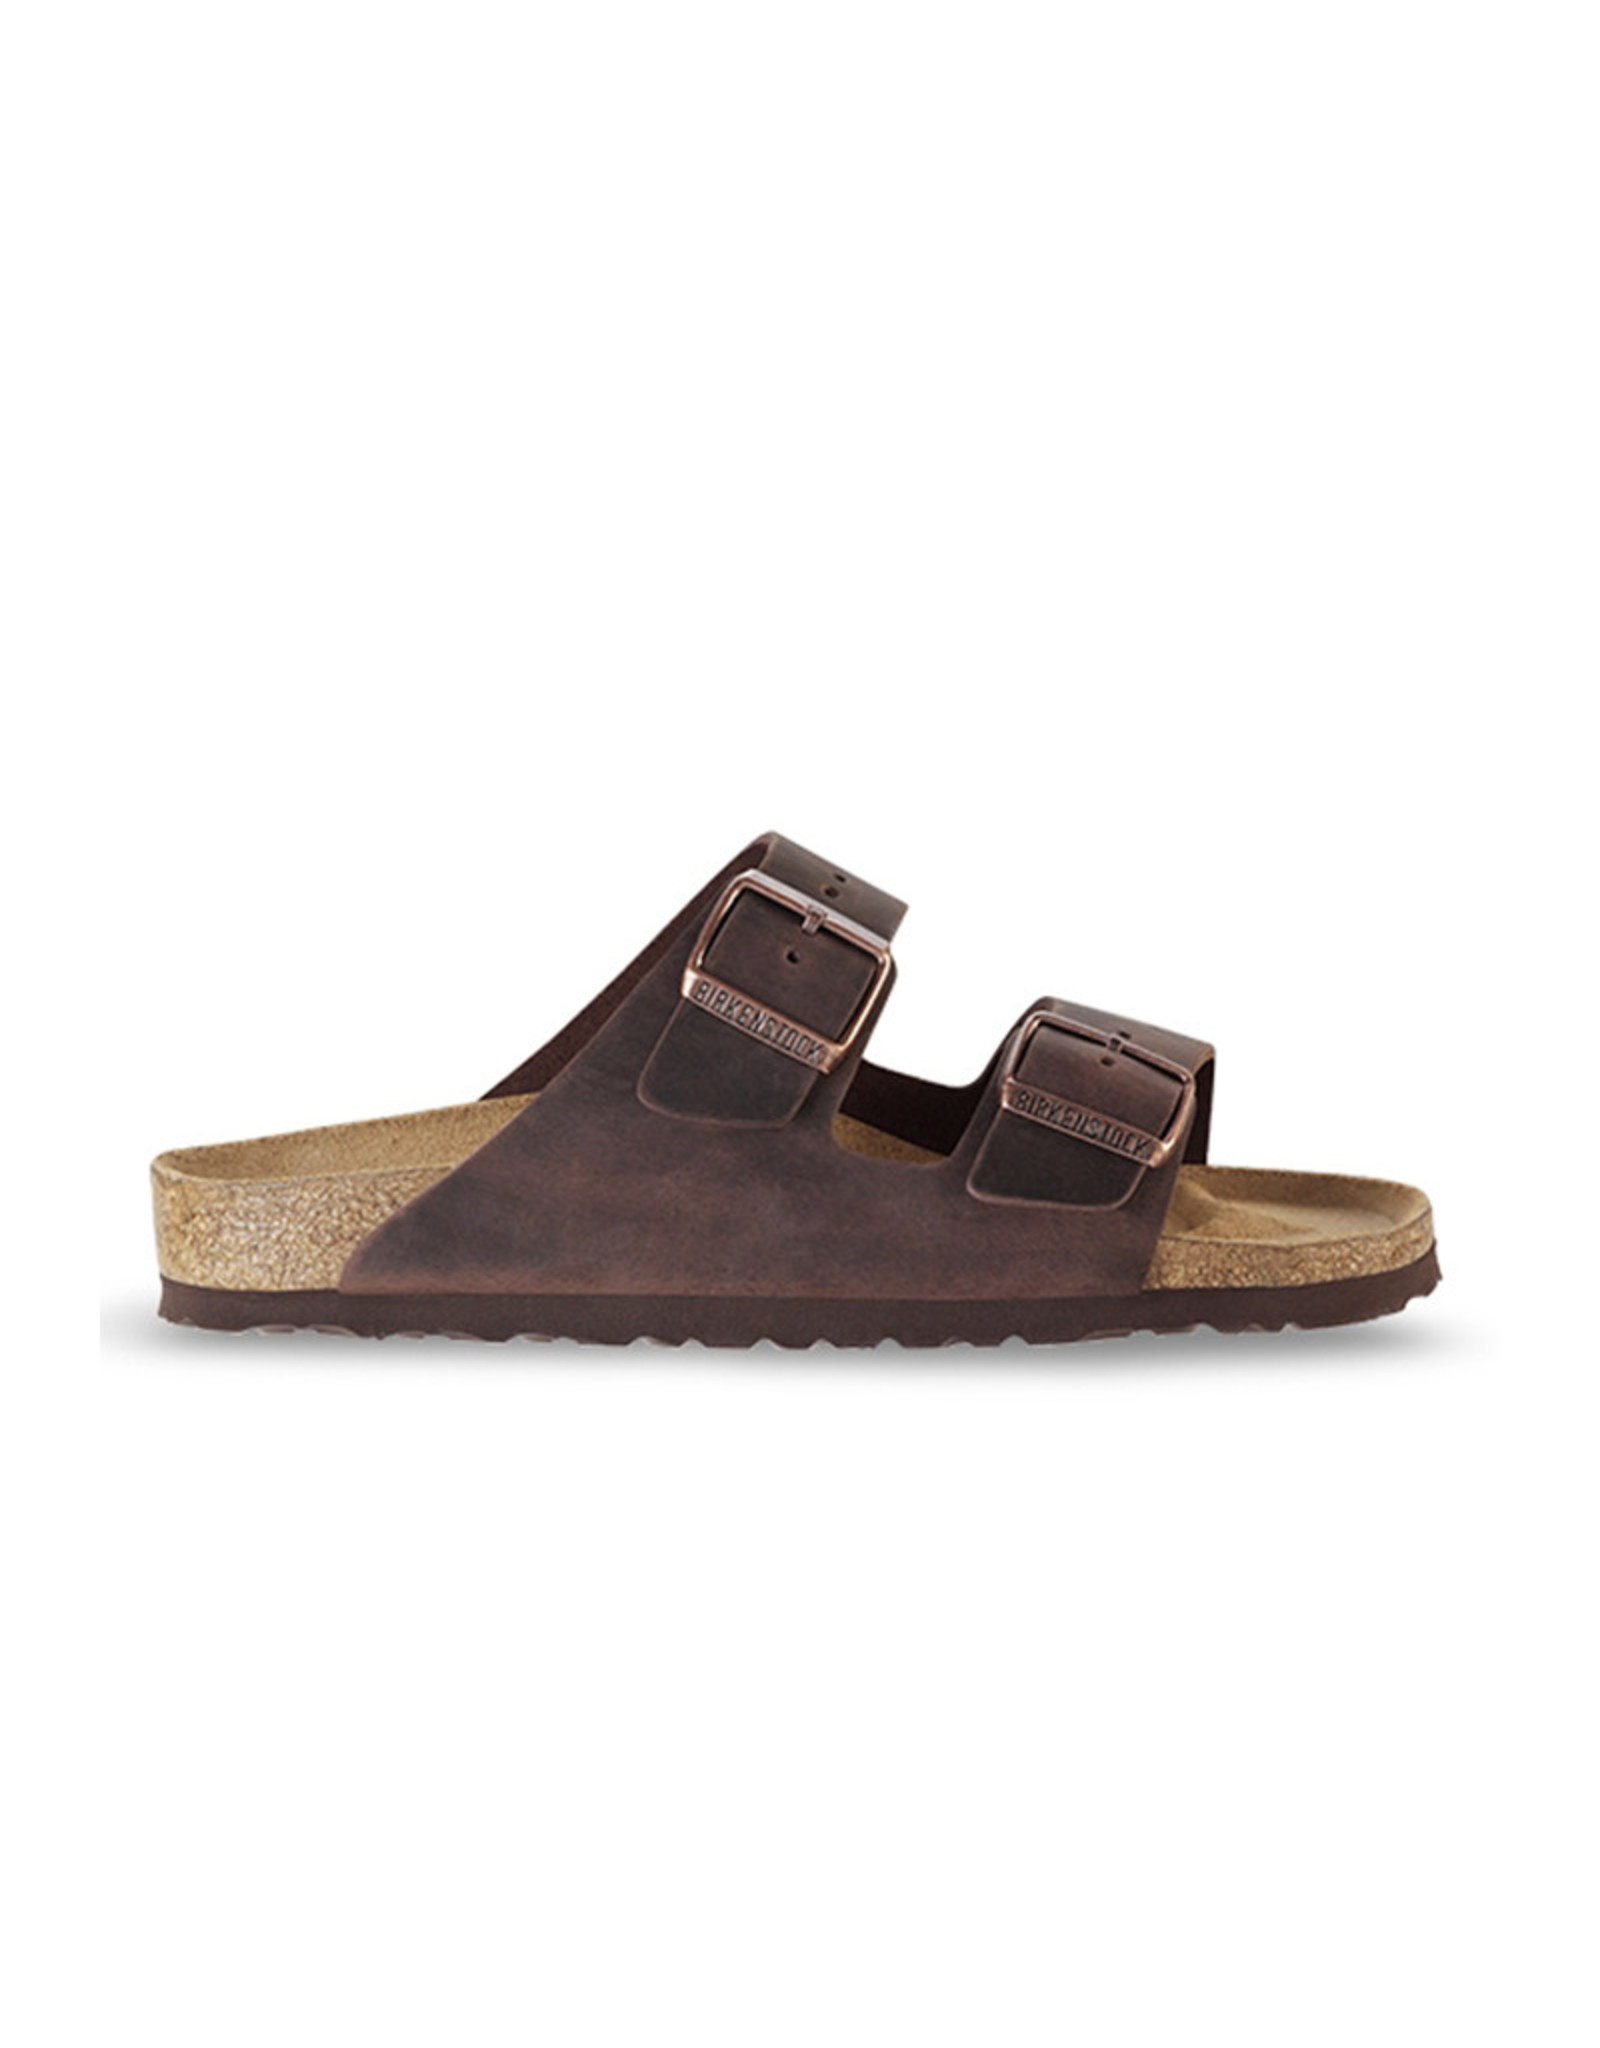 Birkenstock Arizona - Natural Leather in Dark Brown